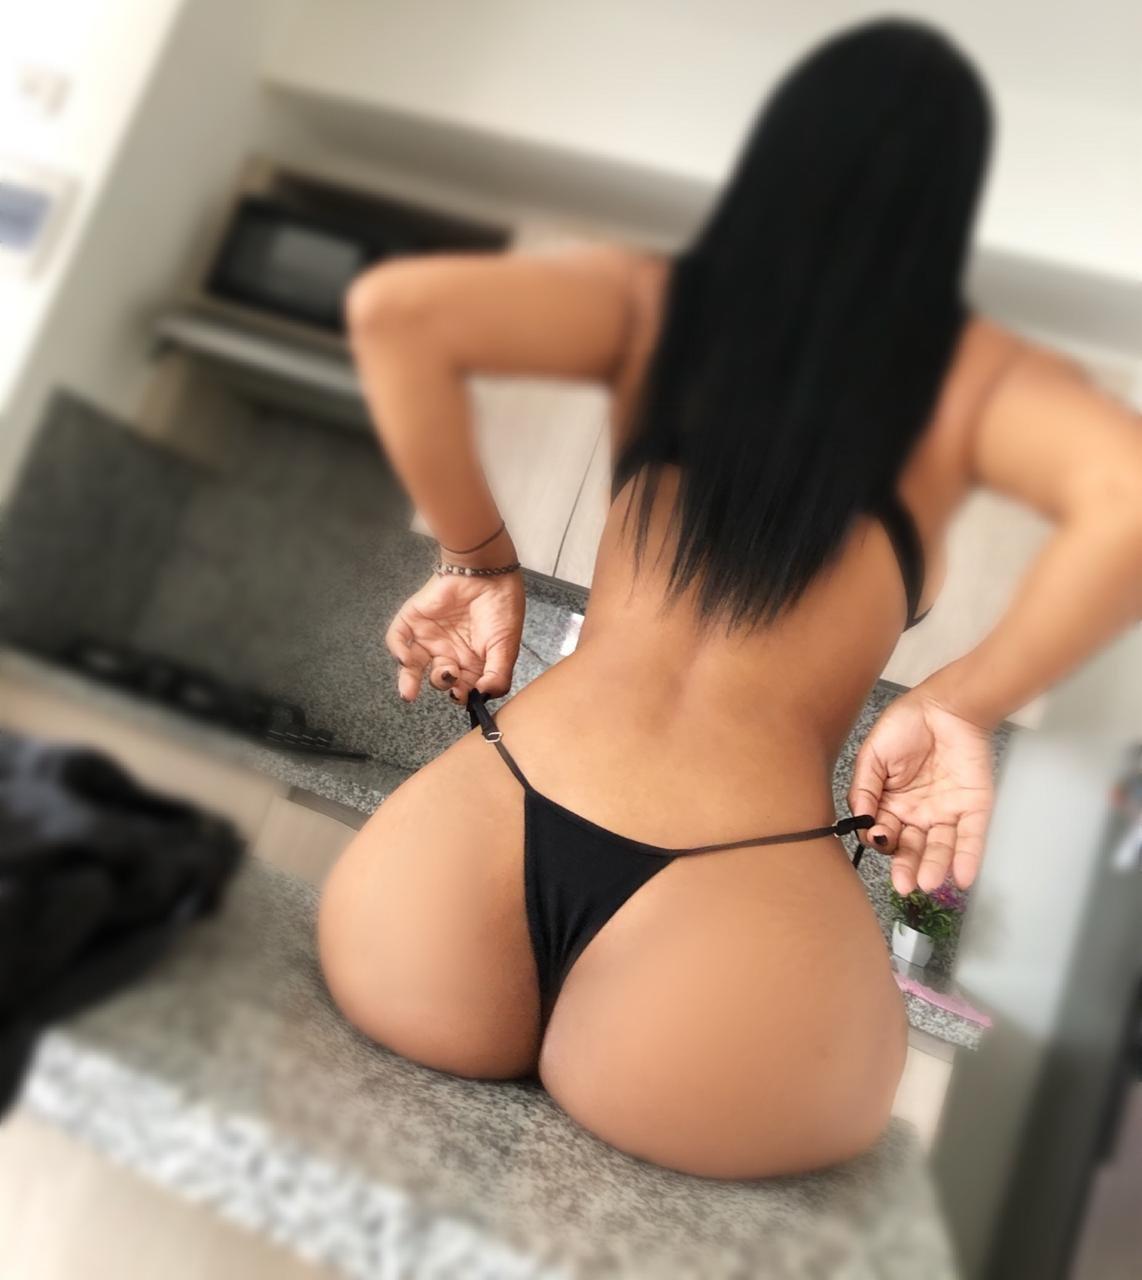 Escorts body rubs in kelownacanada order girl for sex massage photoshutter